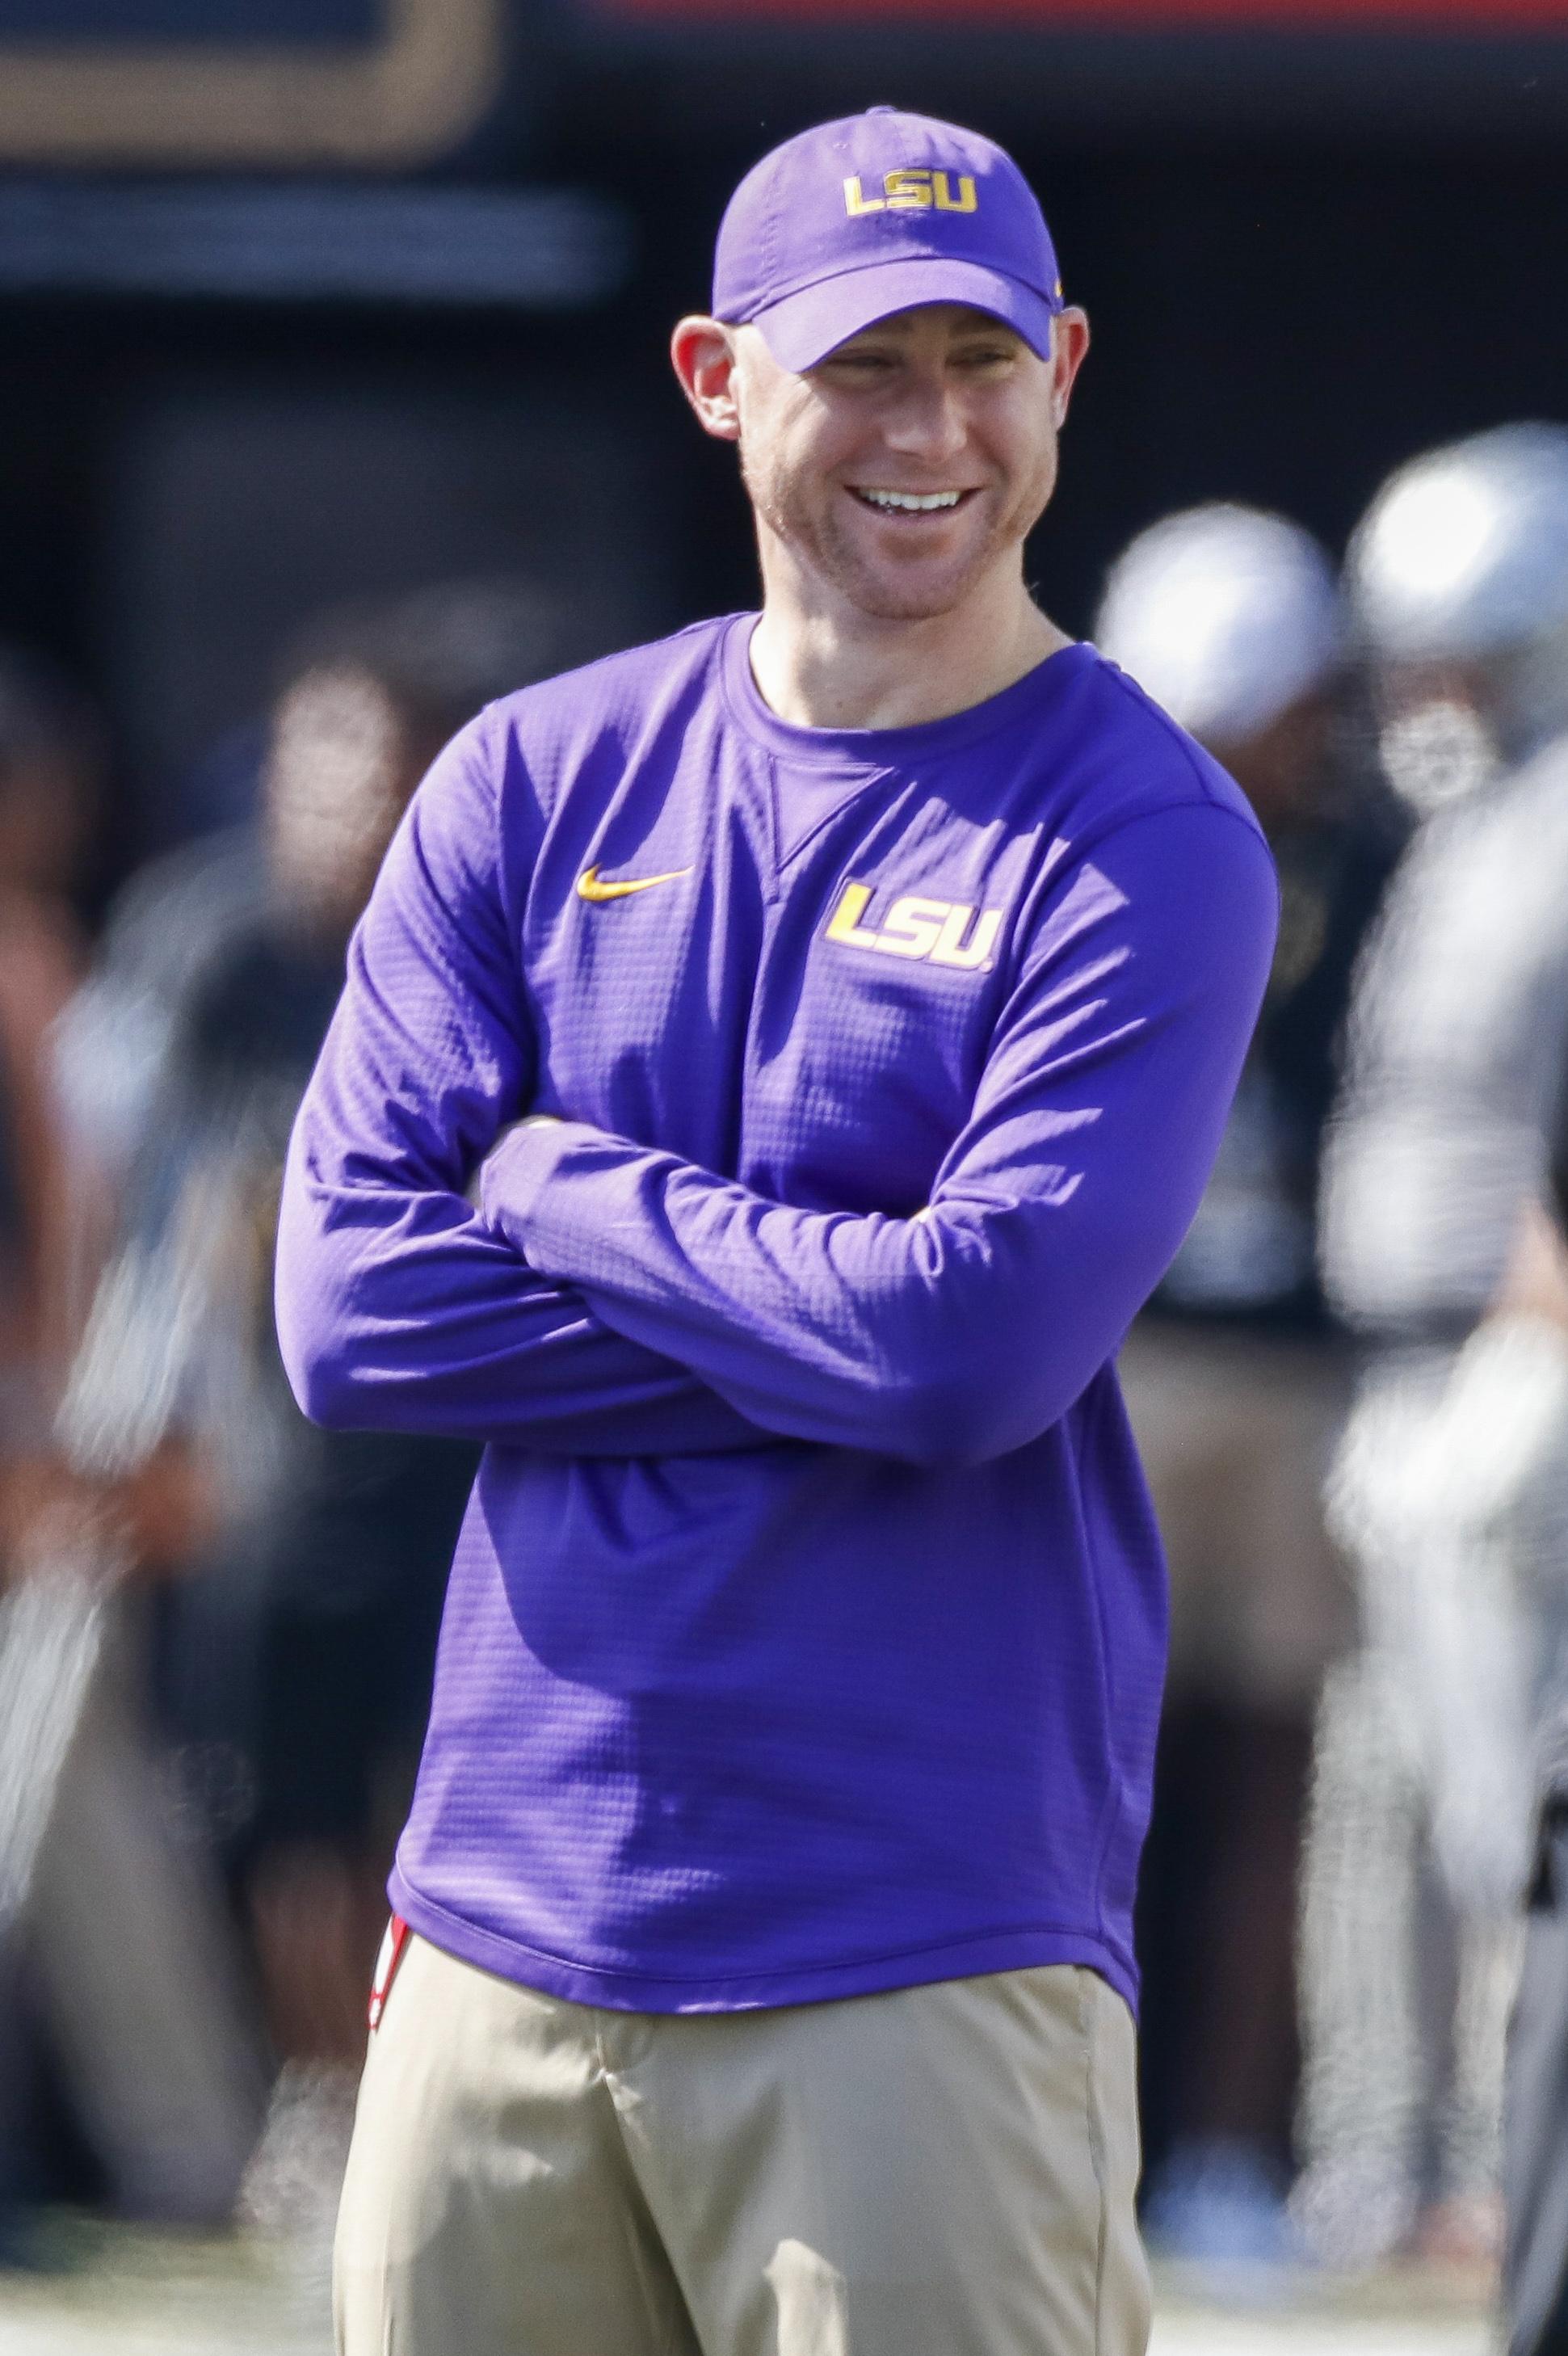 COLLEGE FOOTBALL: SEP 21 LSU at Vanderbilt